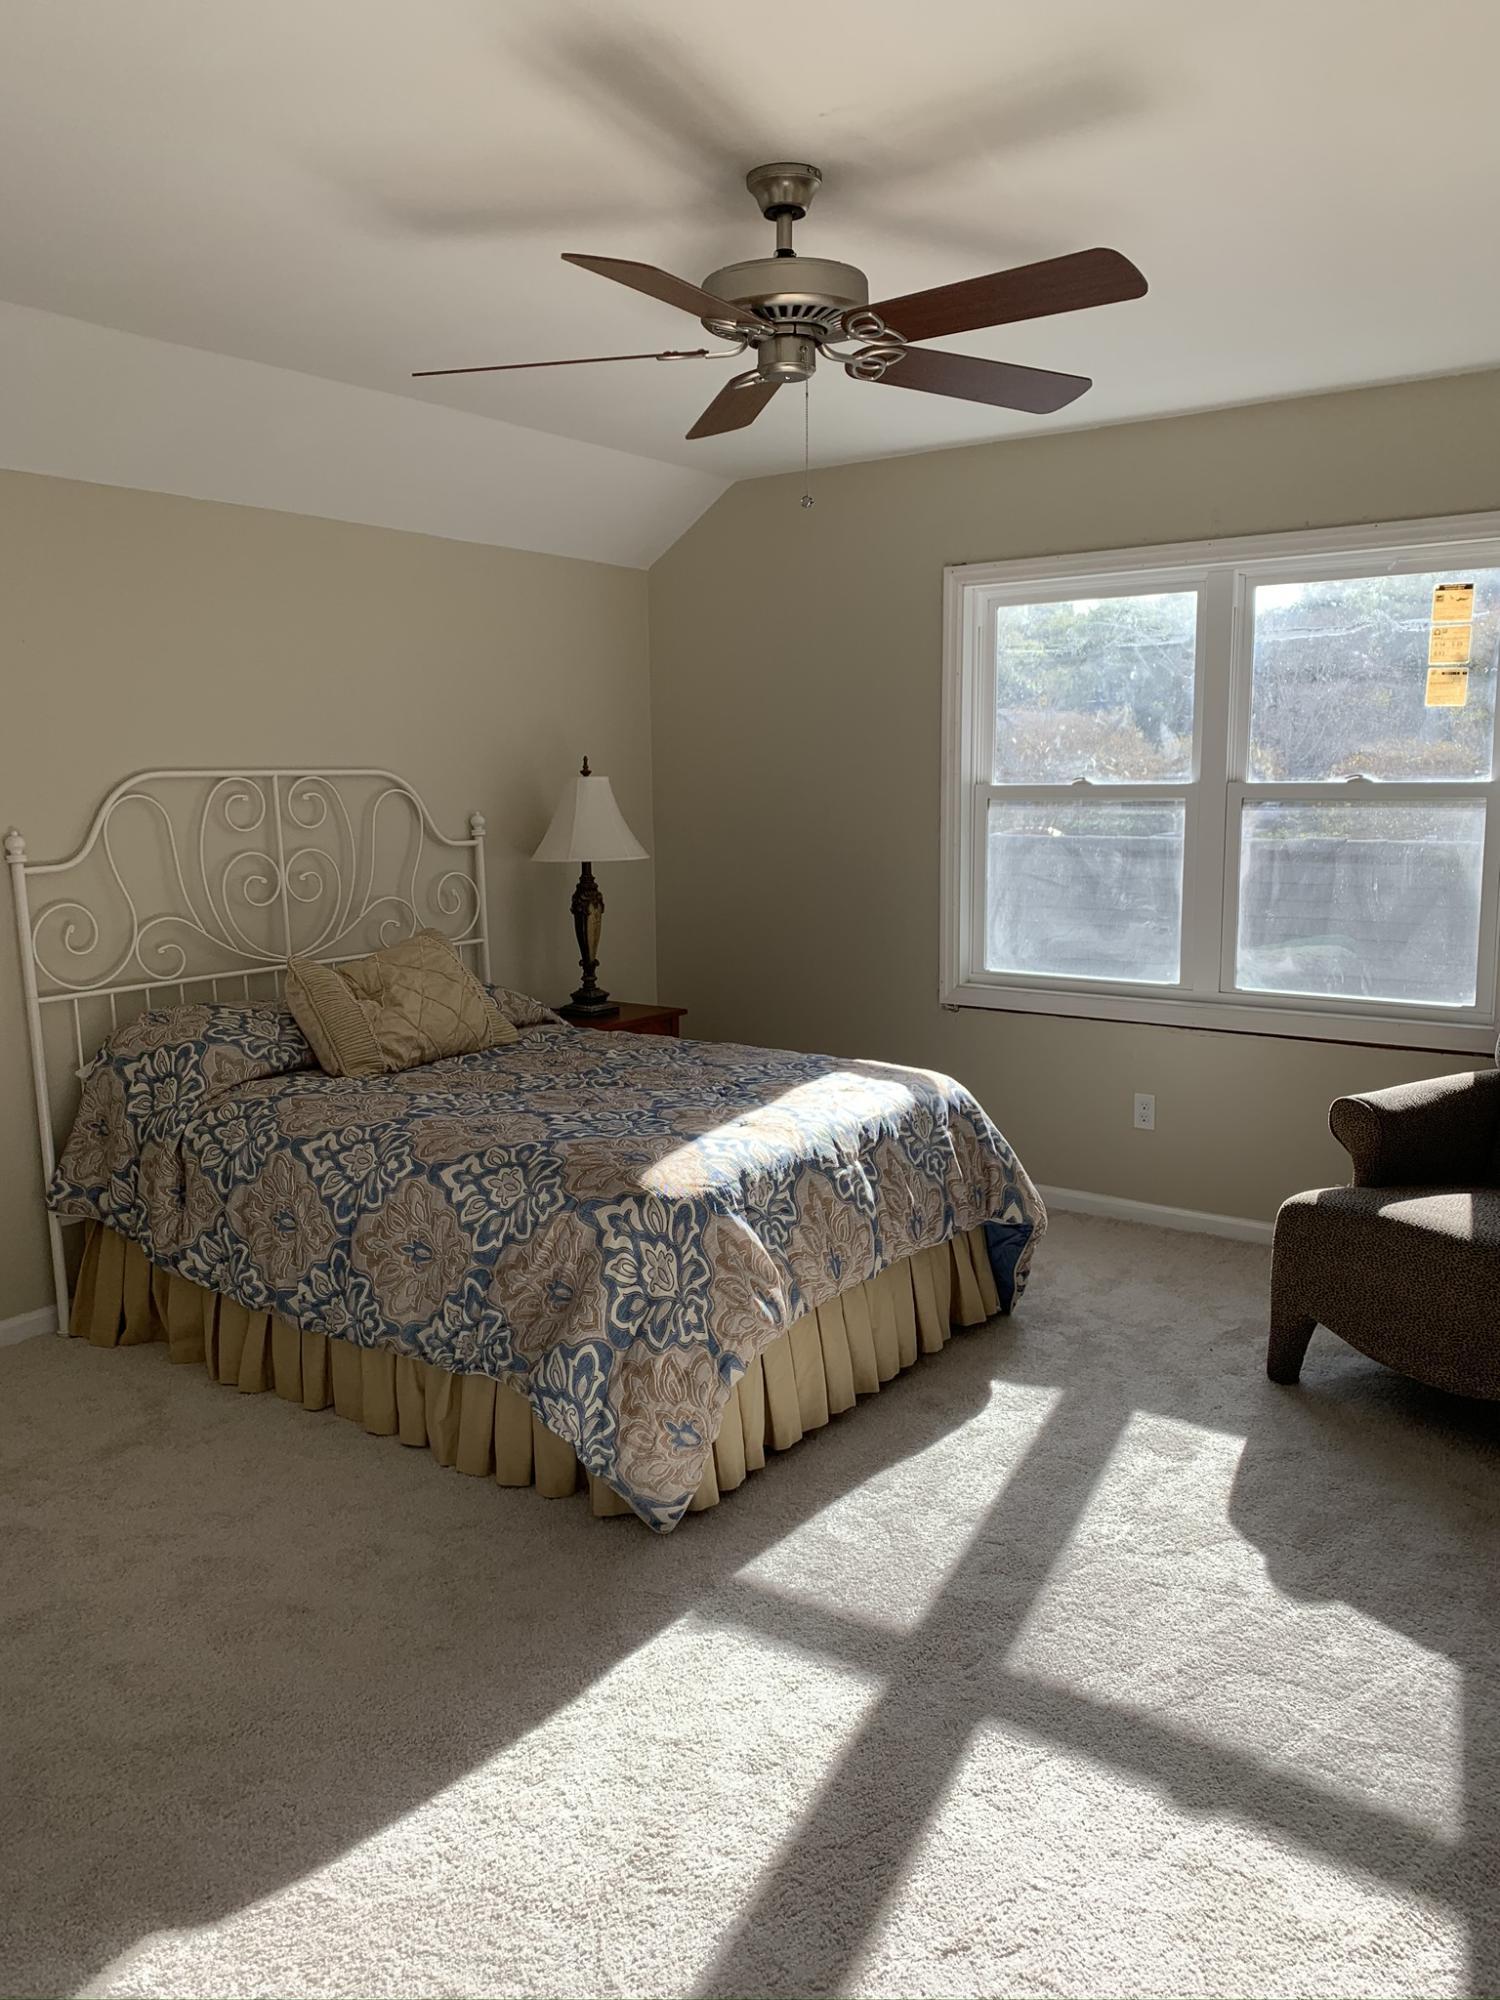 Fox Pond Homes For Sale - 662 Poaug, Mount Pleasant, SC - 2